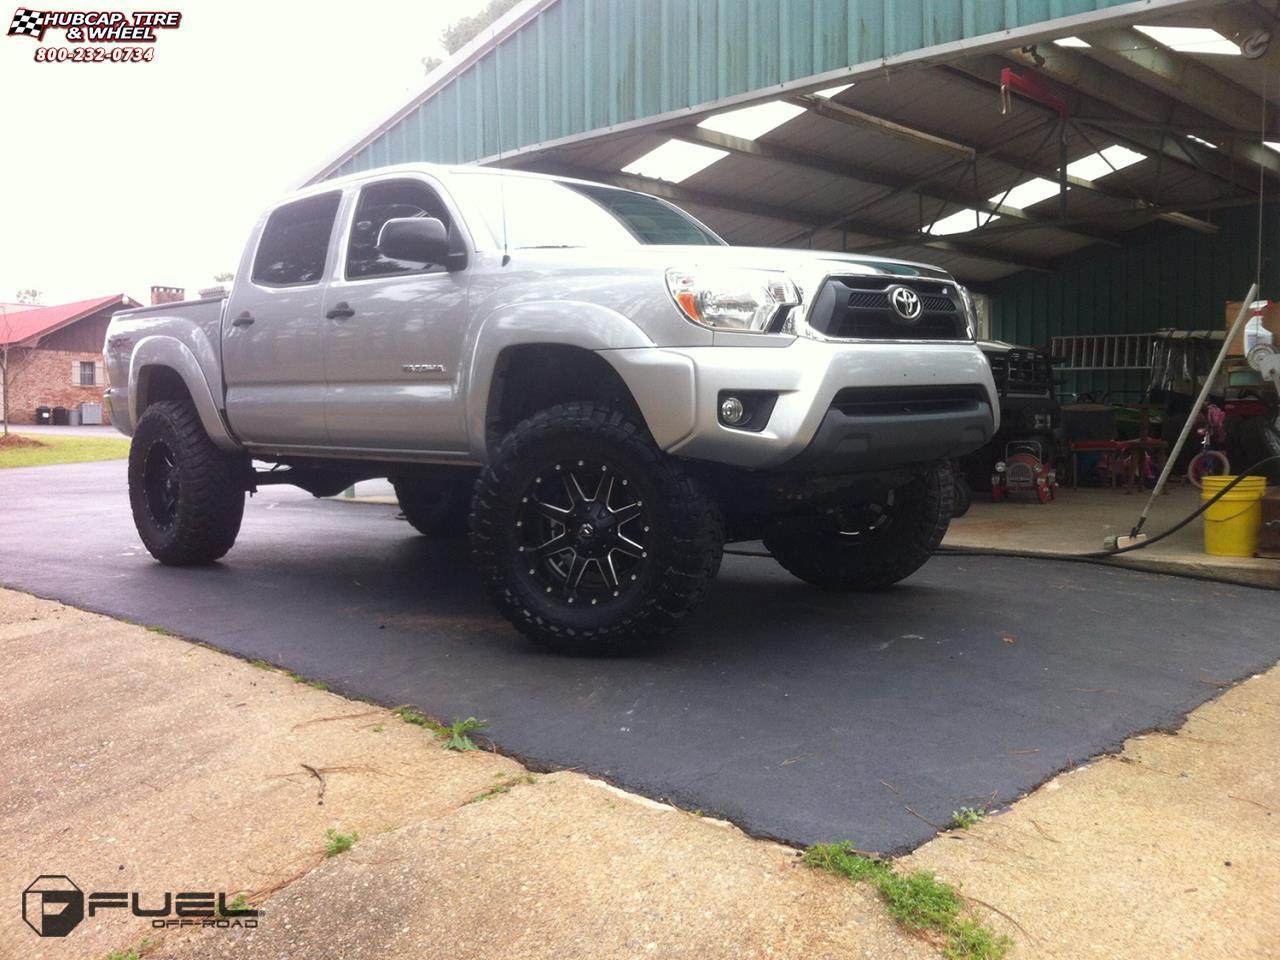 Toyota Tacoma Fuel Maverick D536 Wheels Chrome